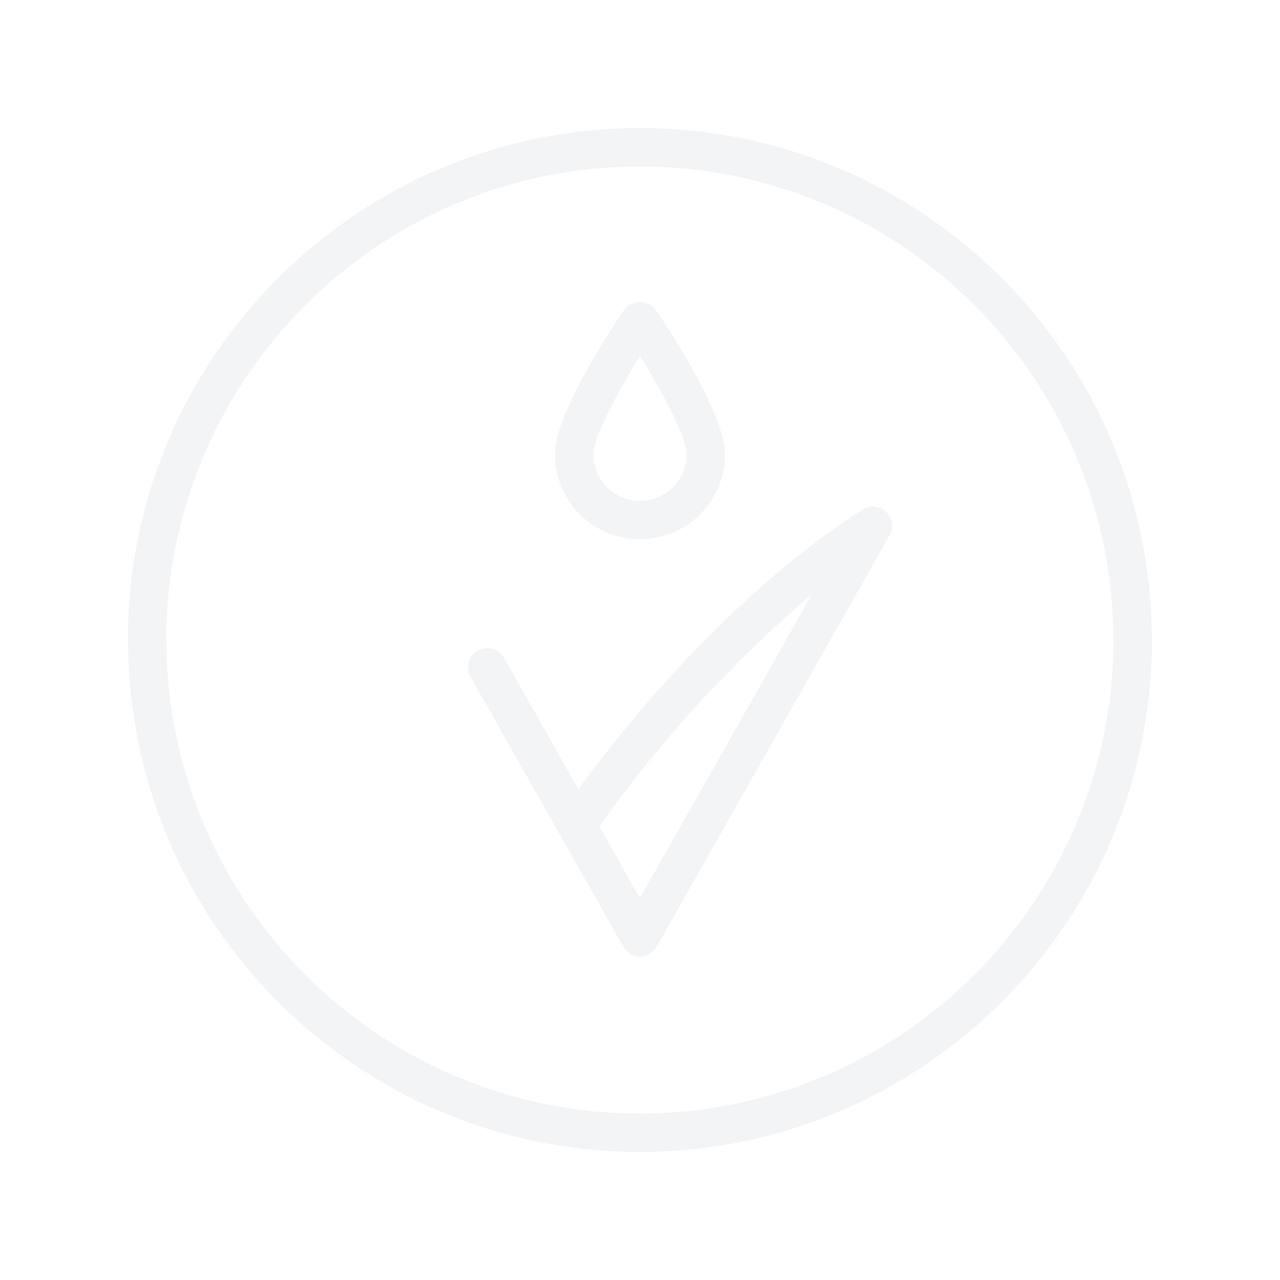 MAKEUP REVOLUTION Pro Precision Sponge (Black)